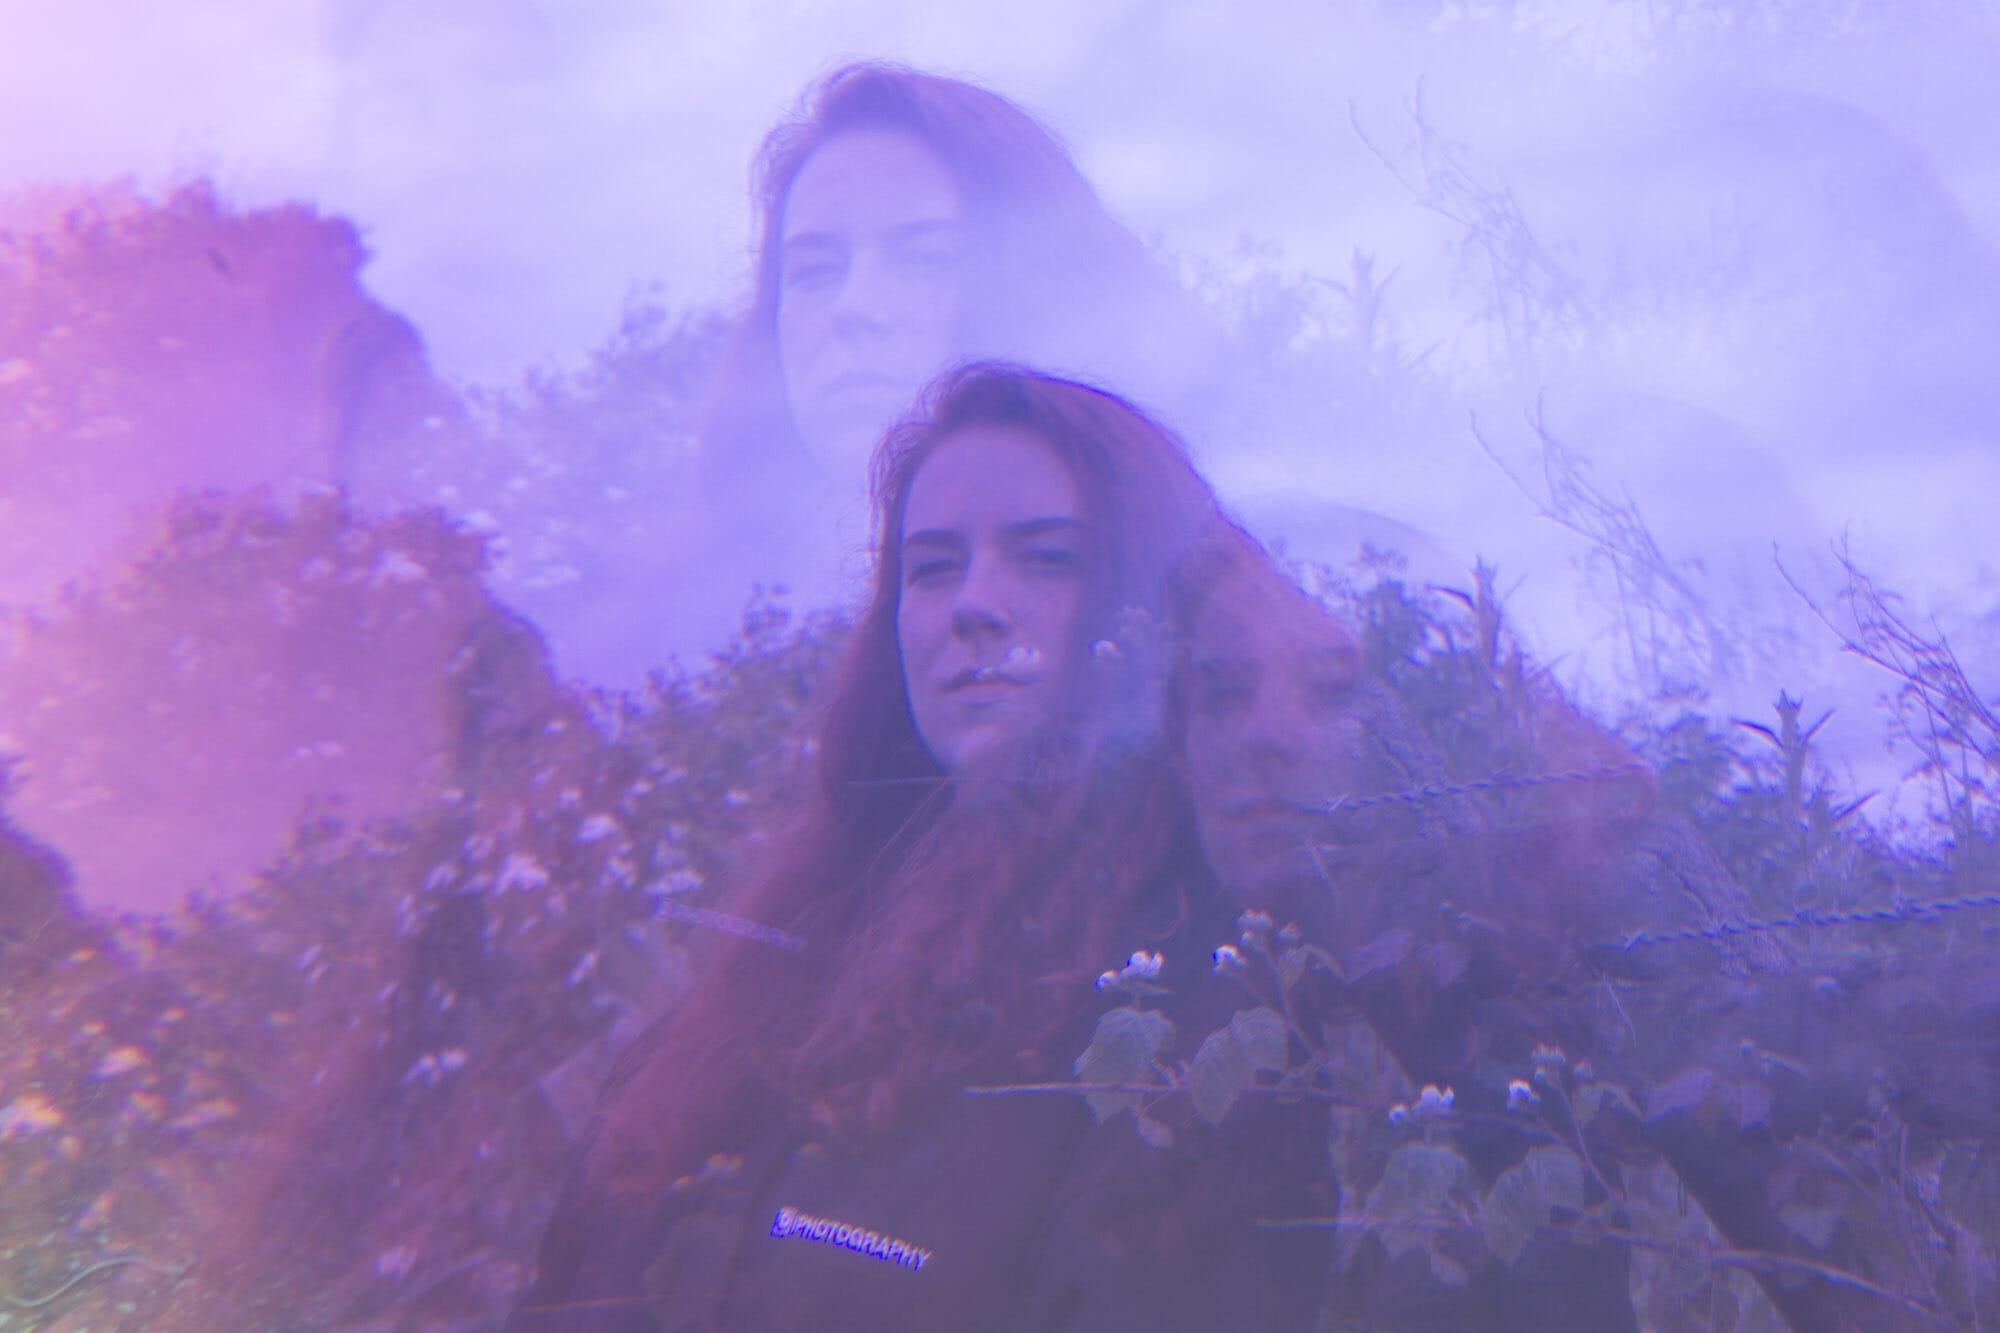 portrait fractal kaleidoscope photography purple